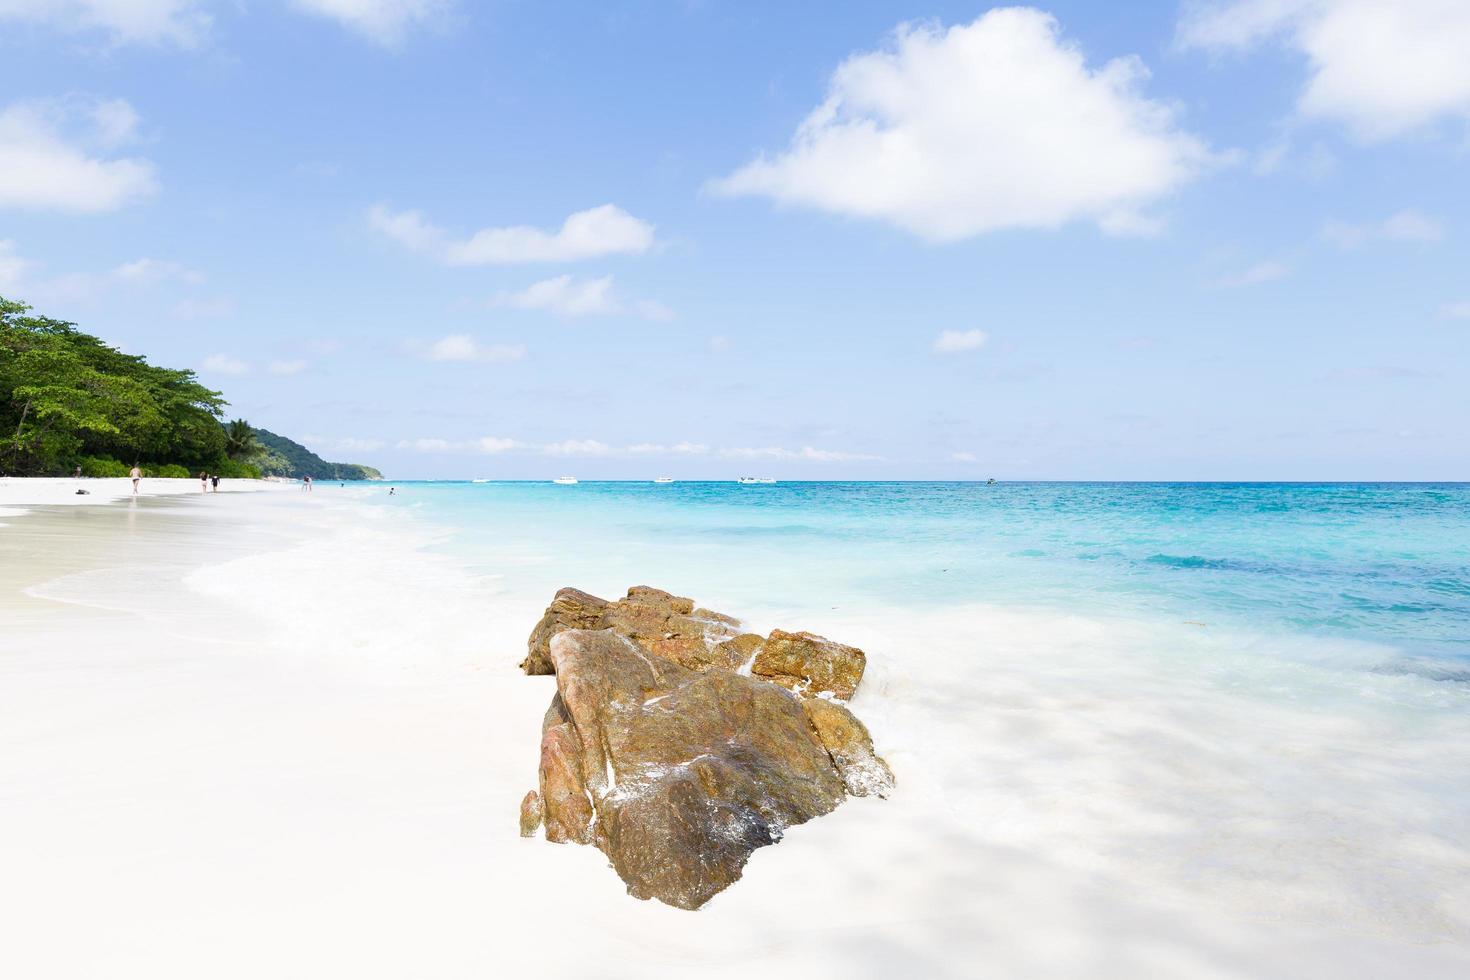 The sea at Phuket in Thailand photo